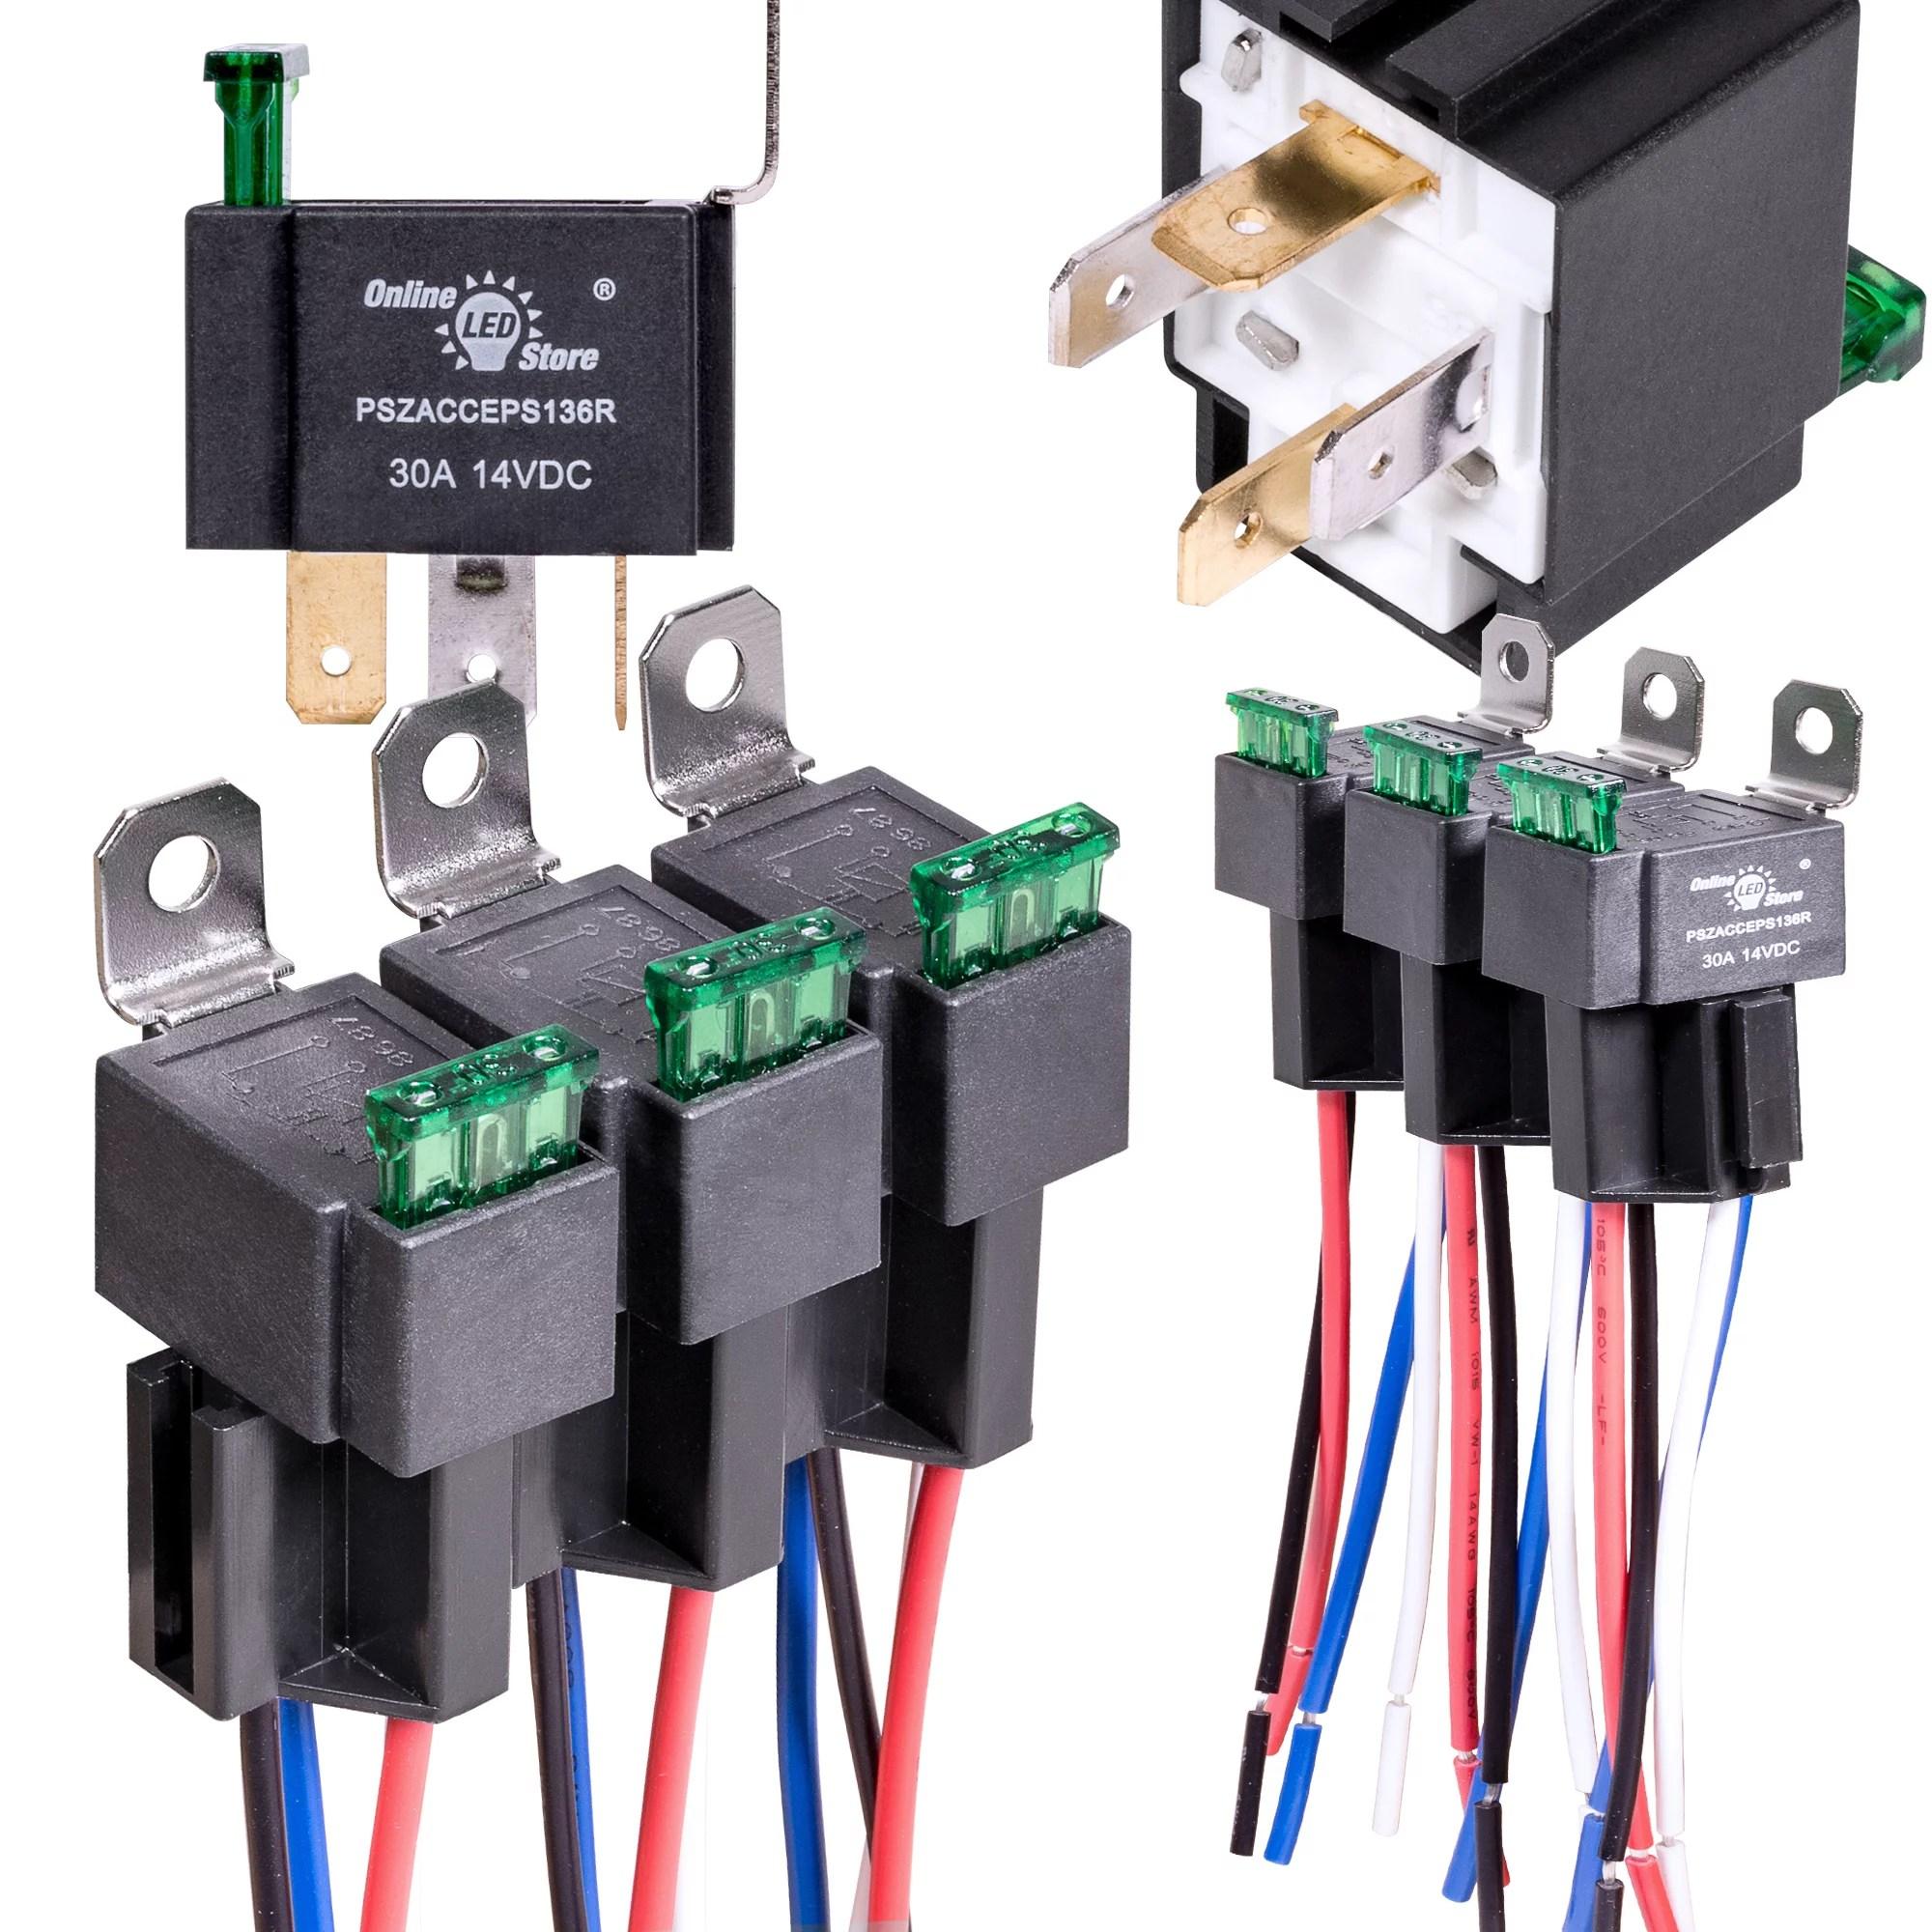 automotive wiring harness pin styles wiring diagram database automotive wiring harness pin styles [ 2000 x 2000 Pixel ]